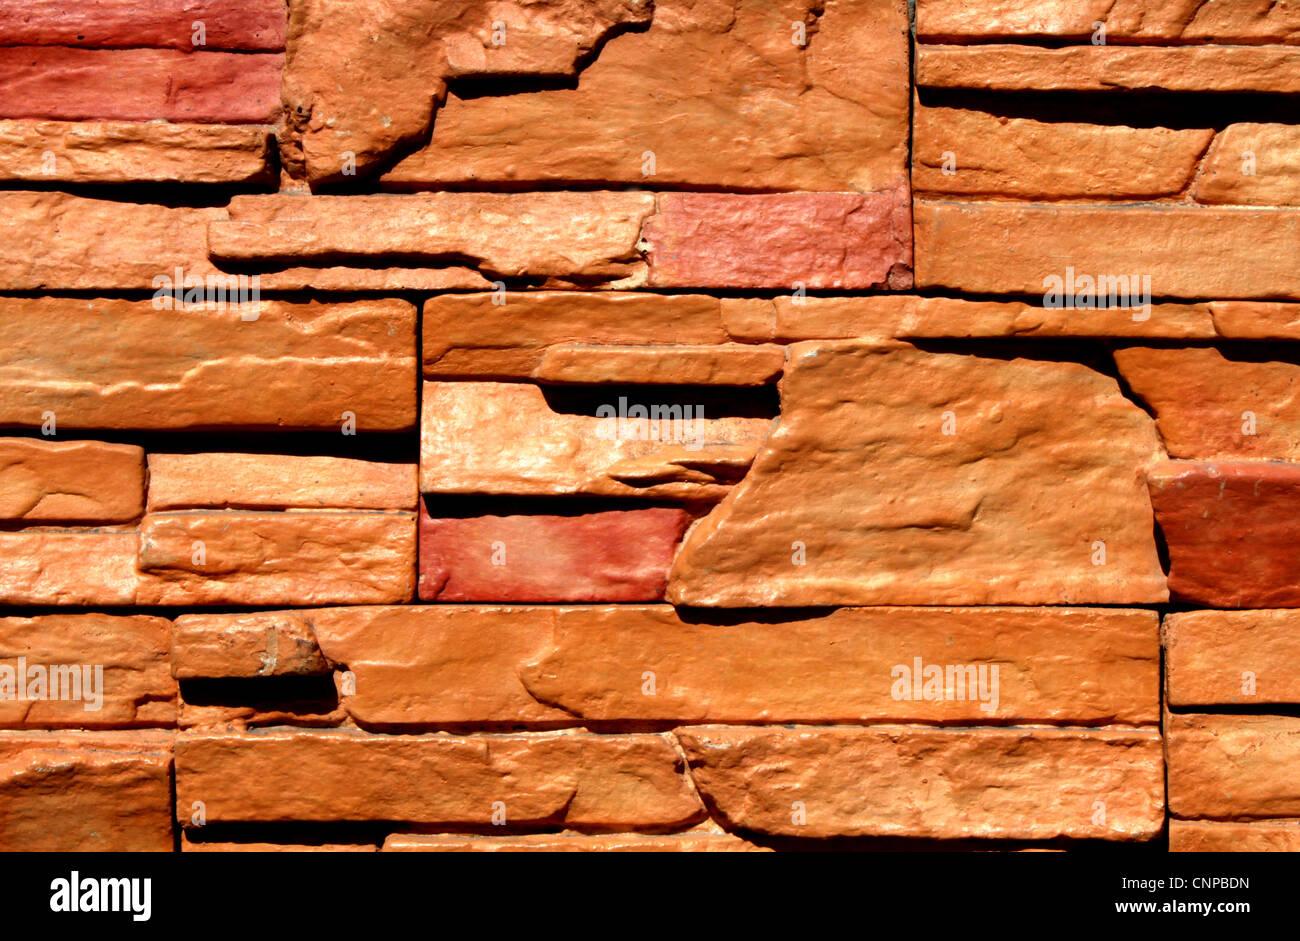 Stone Bricks Decor Installed On House Exterior Wall Stock